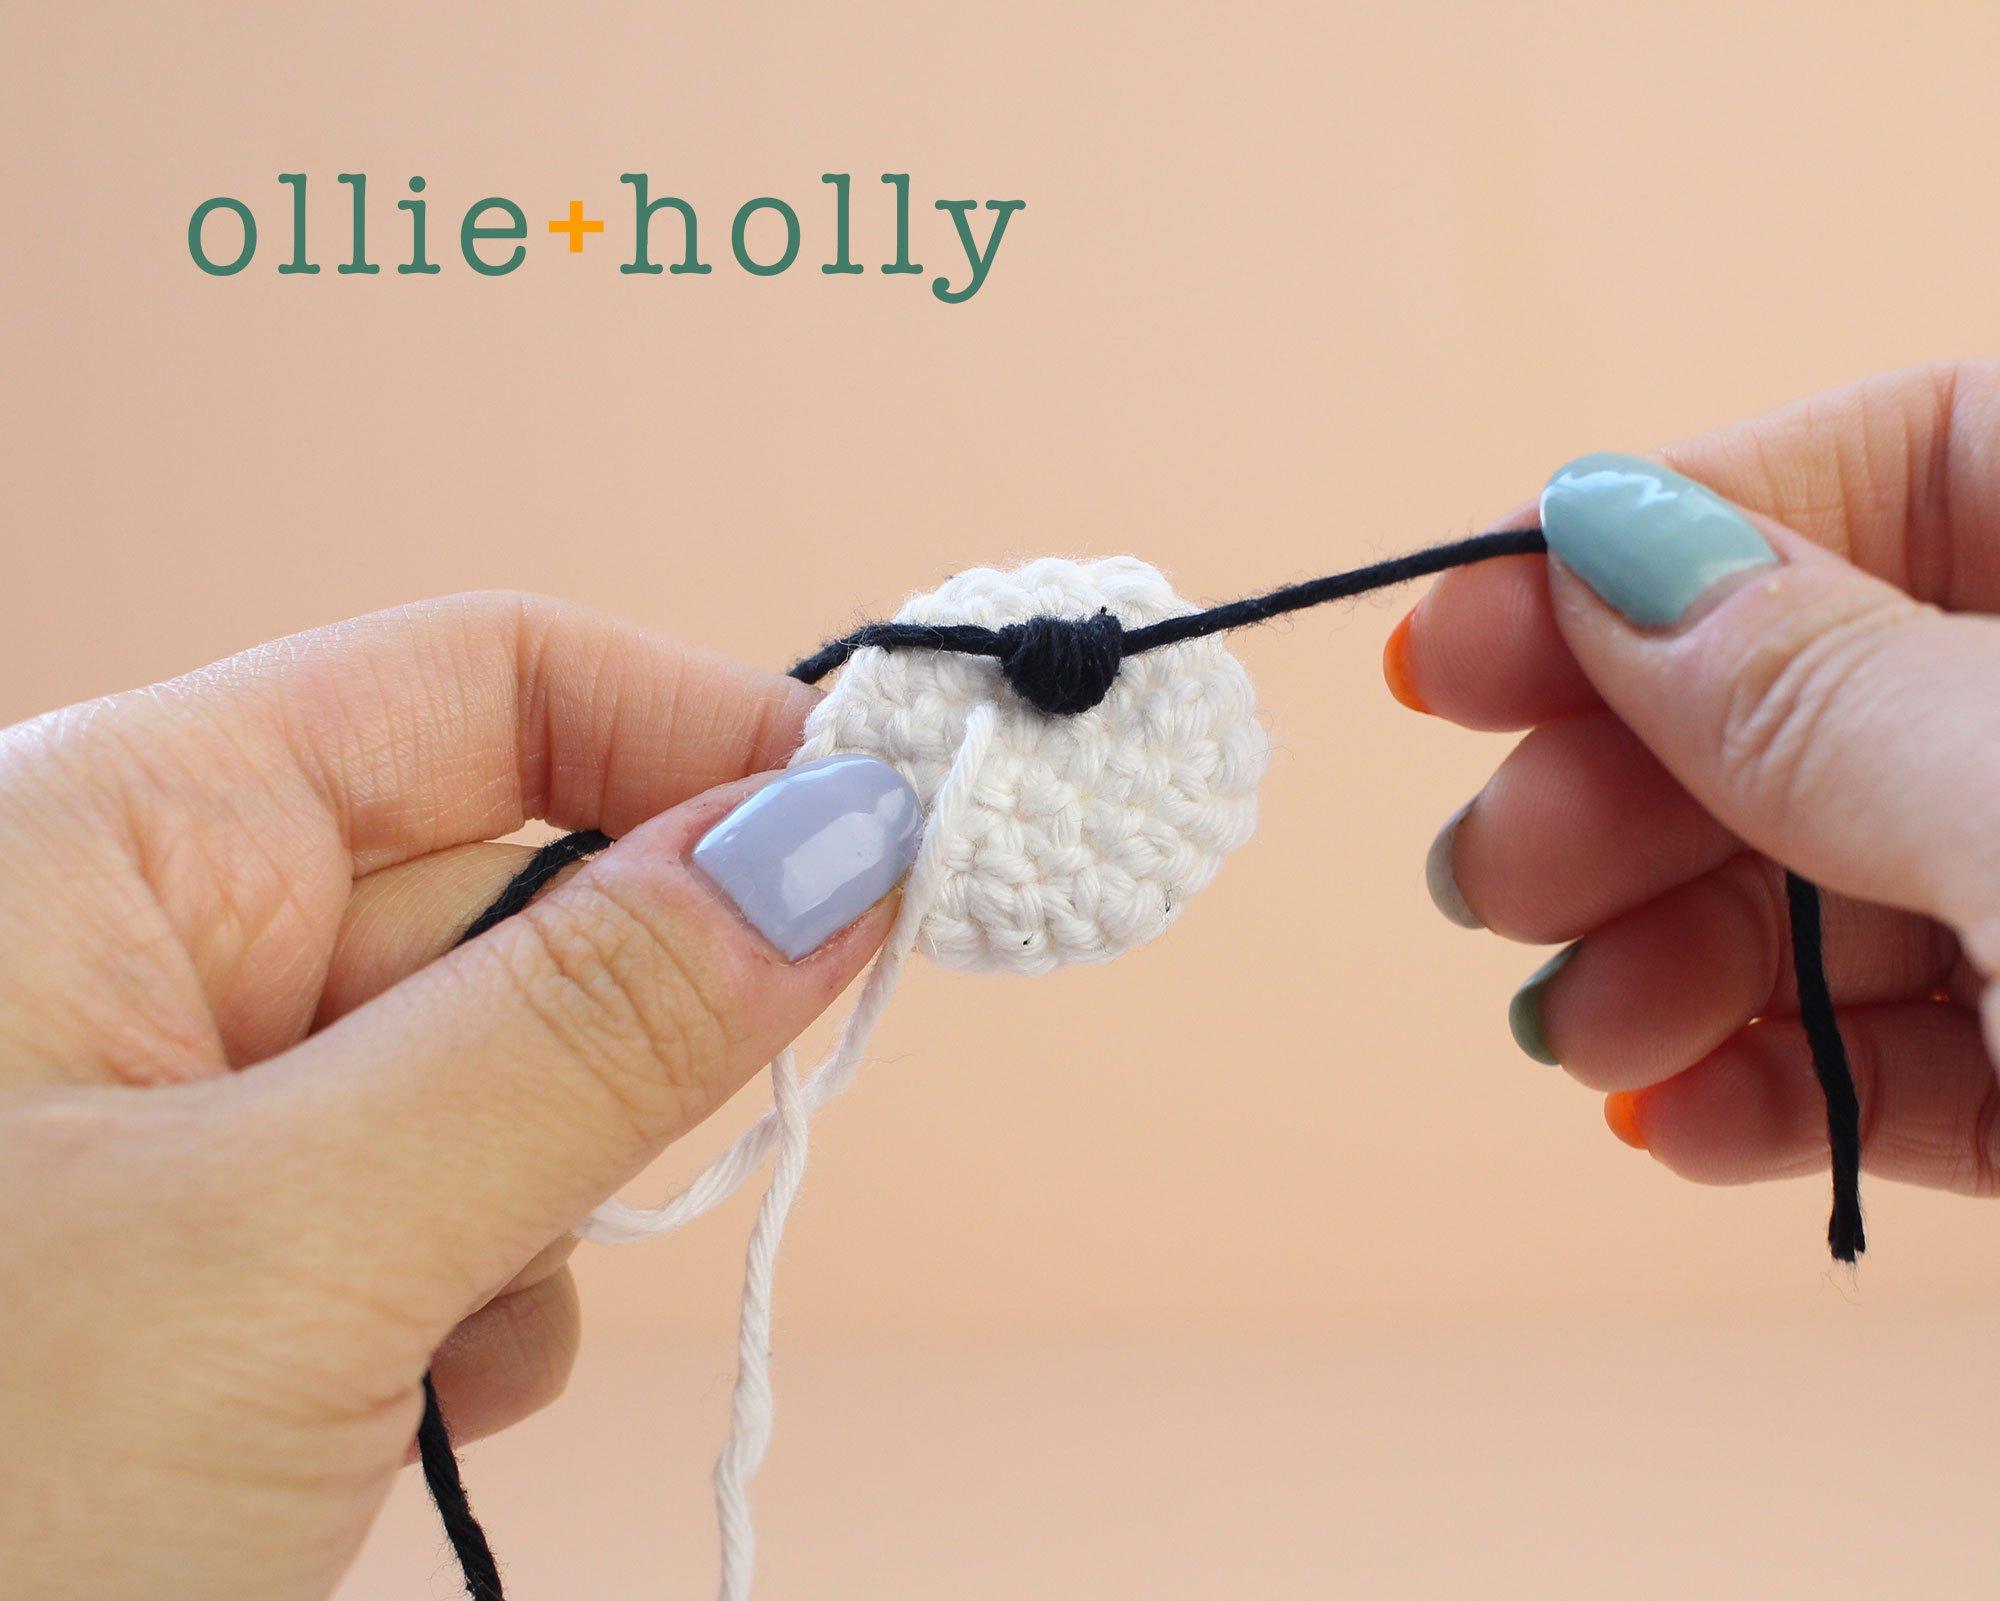 Free Louise Belcher's Stuffed Animal Kuchi Kopi (from Bob's Burgers) Amigurumi Crochet Pattern Step 6